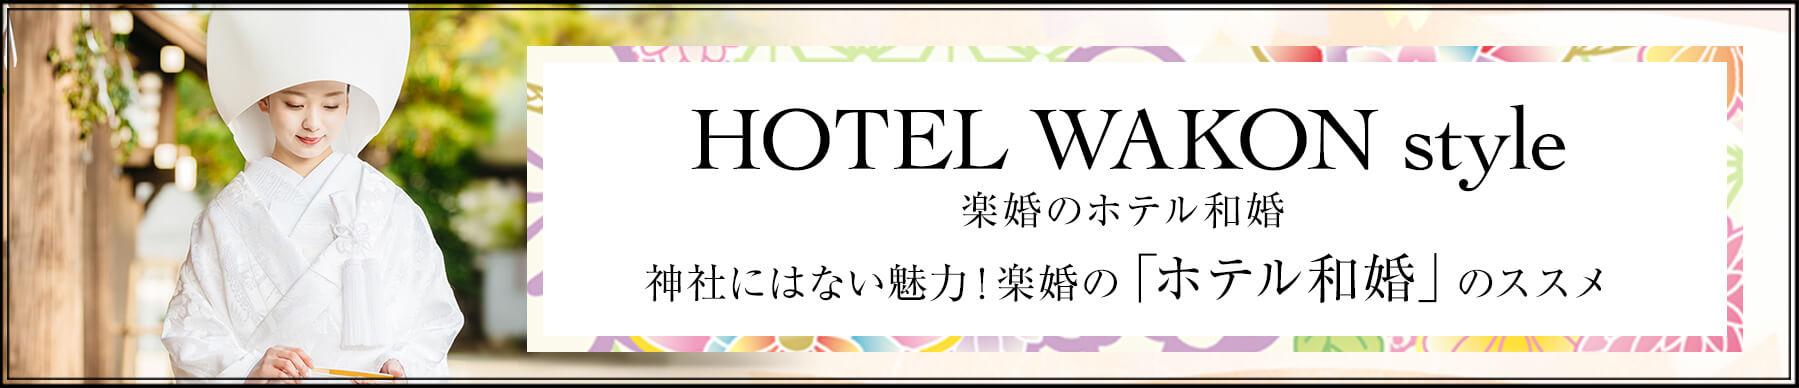 HOTEL WAKON style - 楽婚のホテル和婚